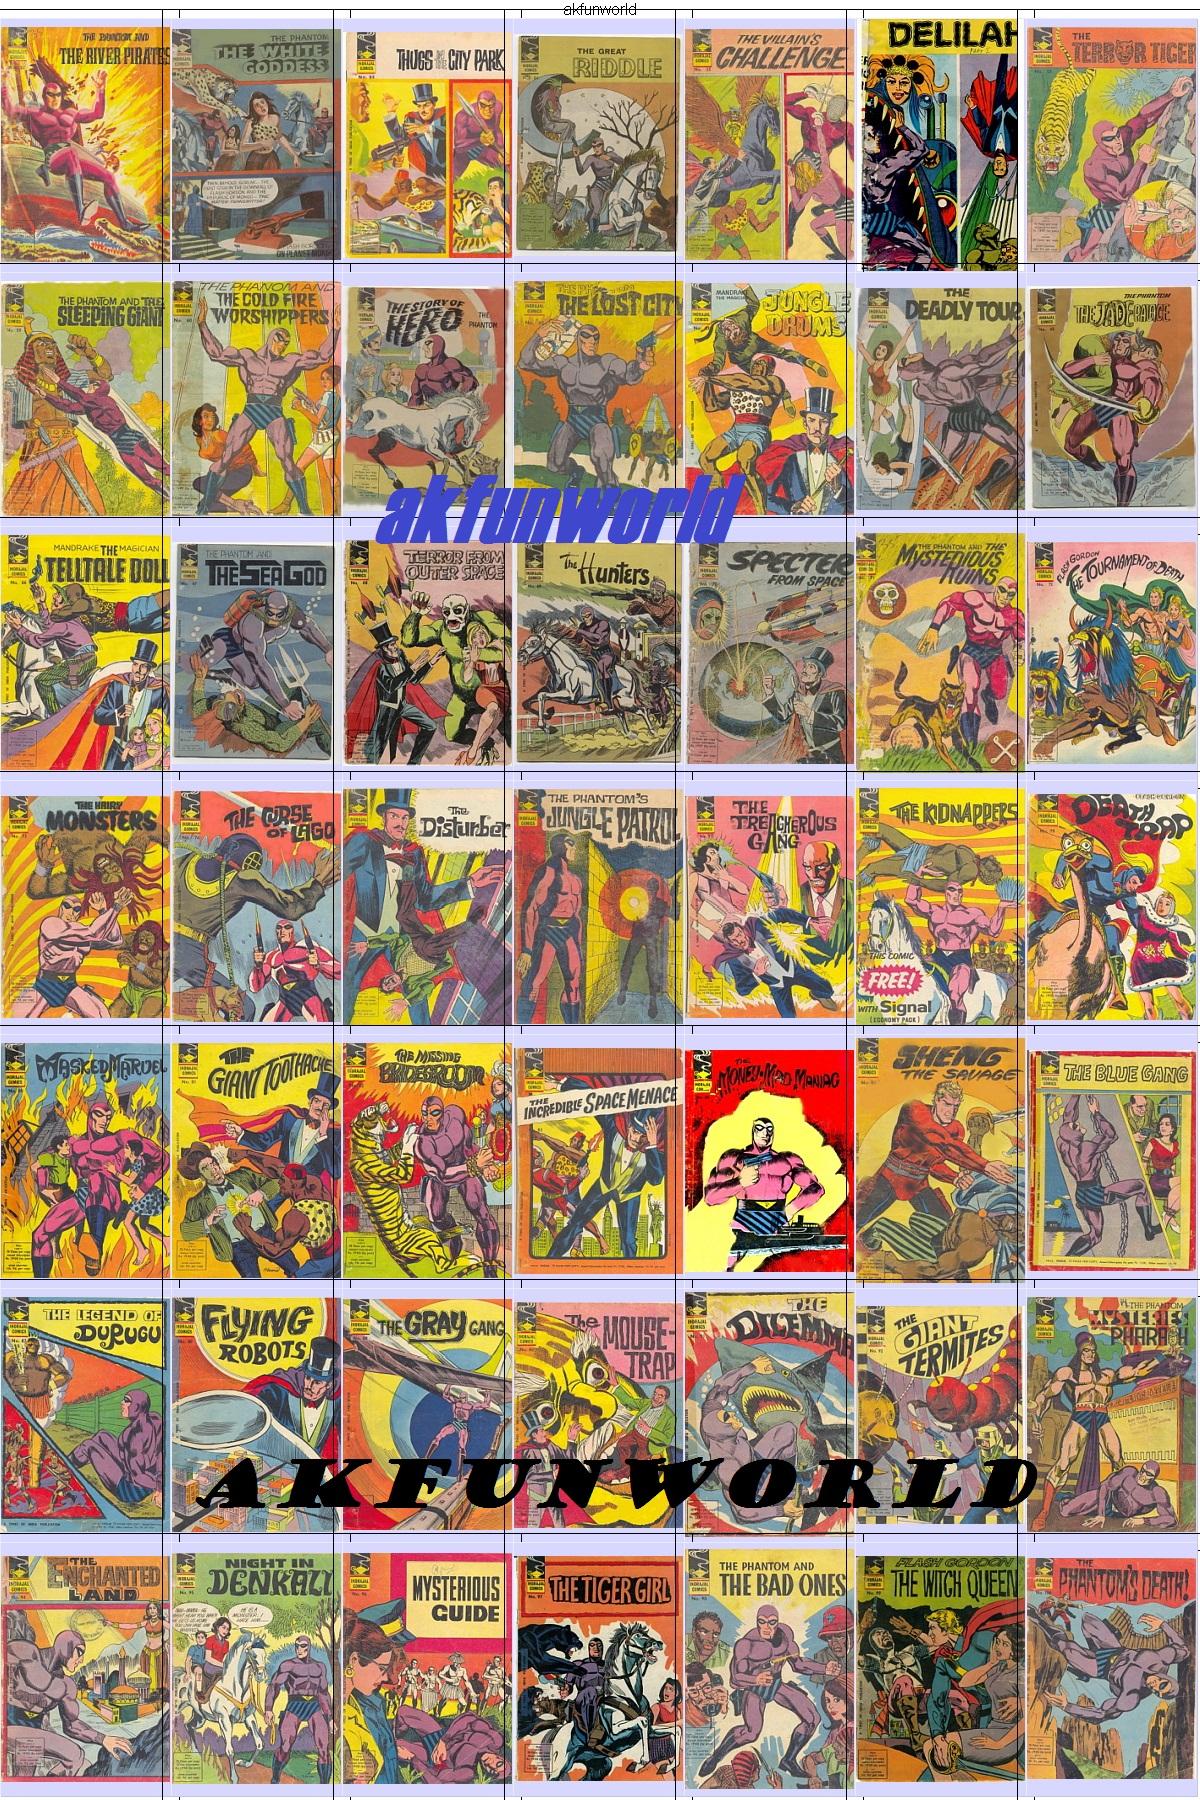 Mega Post: Indrajal Comics [English] Issue 51 to 100 All comics free